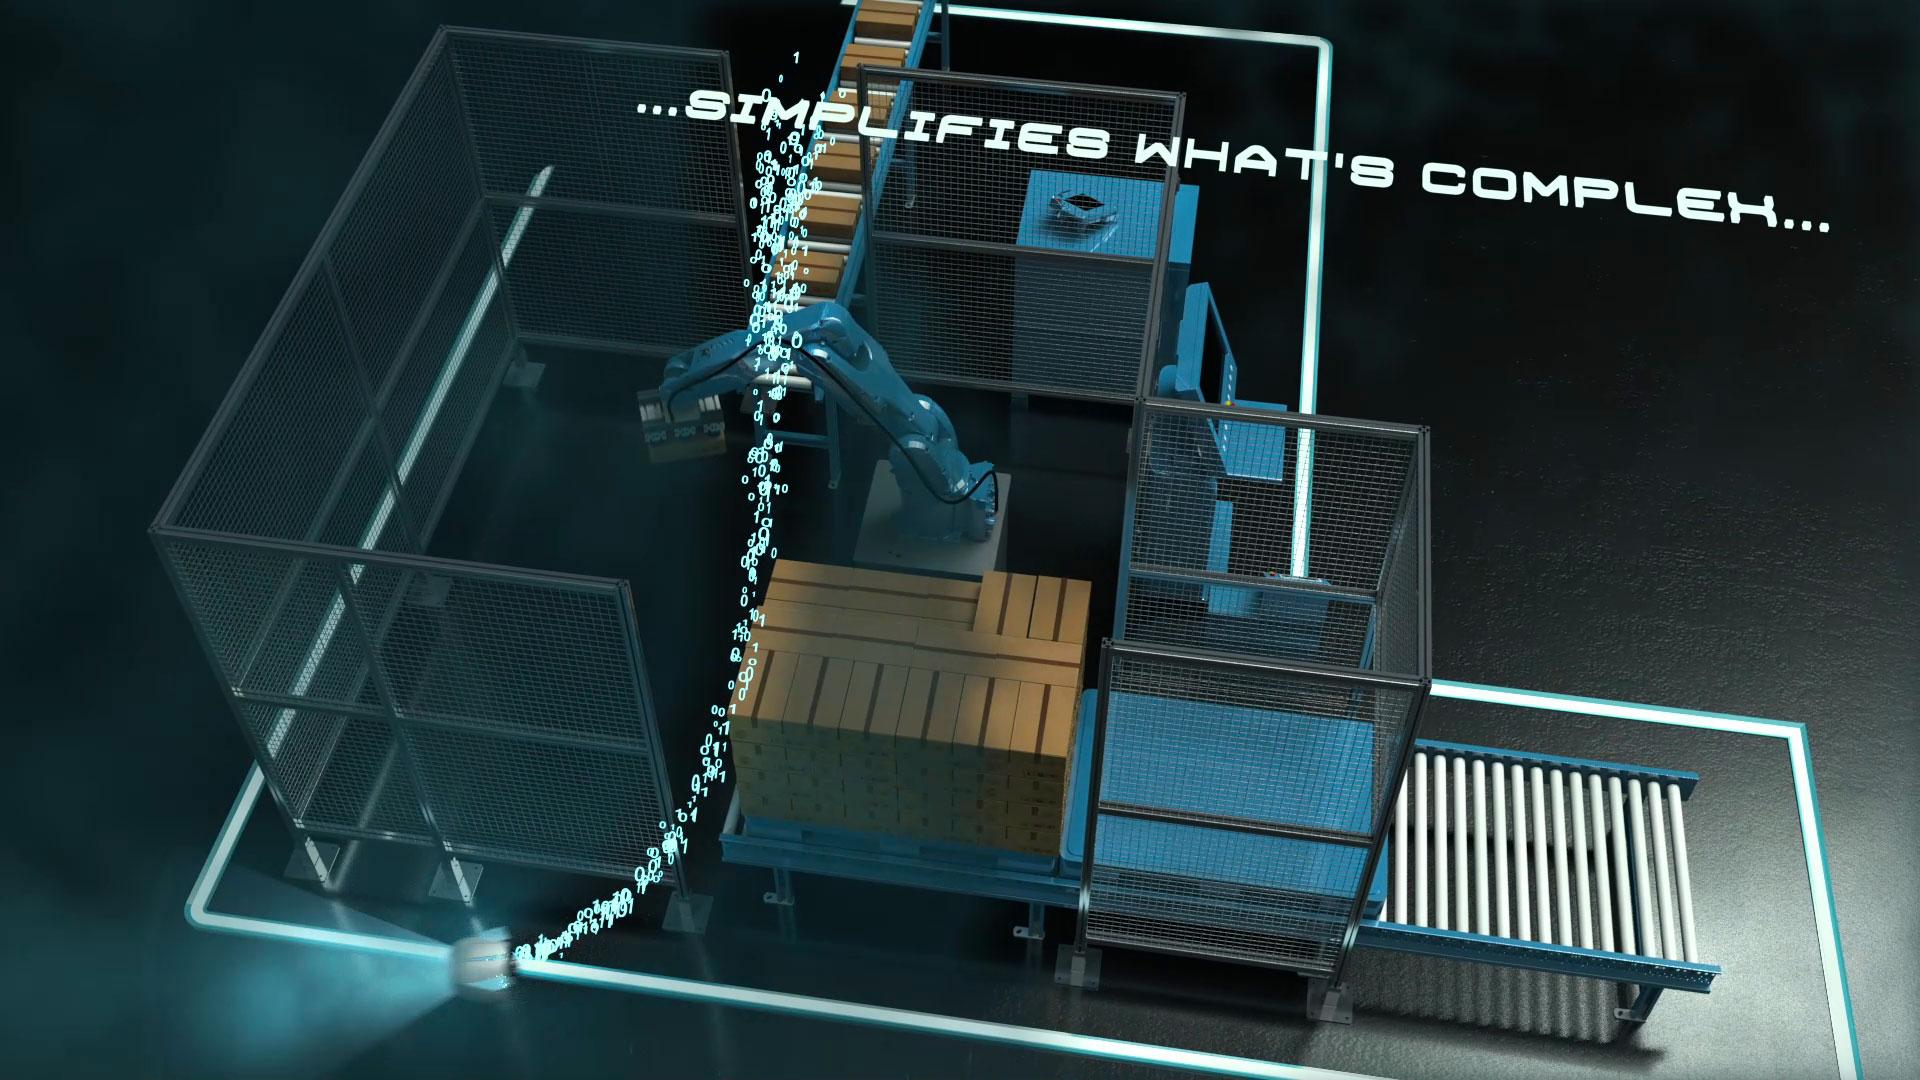 Video 3D teaser commerciale di prodotto per Easyrobot